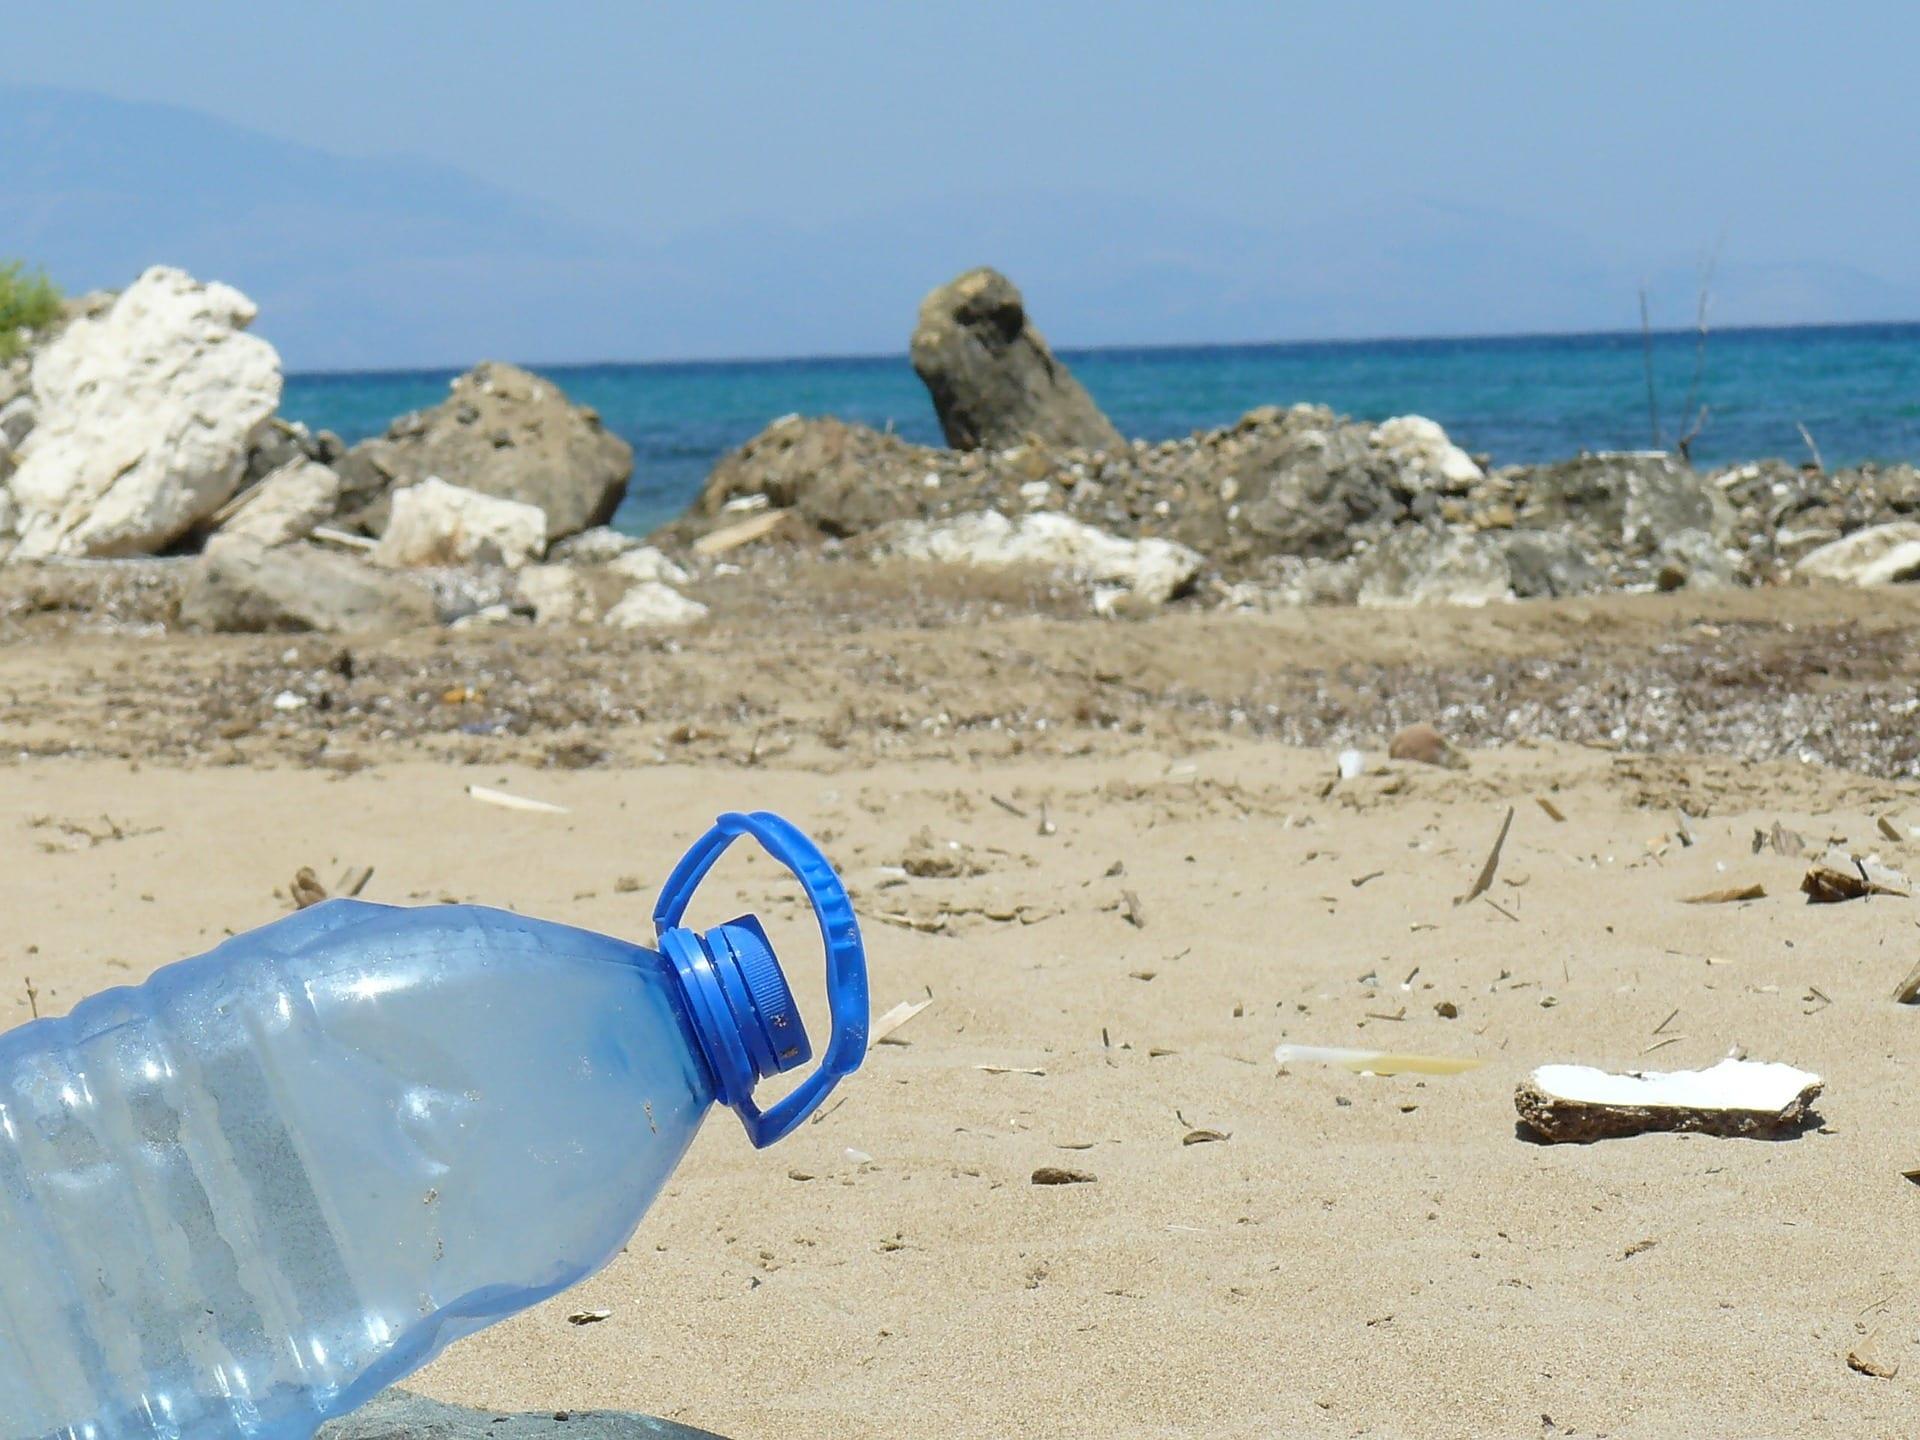 G7 Work to Reduce Plastic Waste through the Ocean Plastics Charter